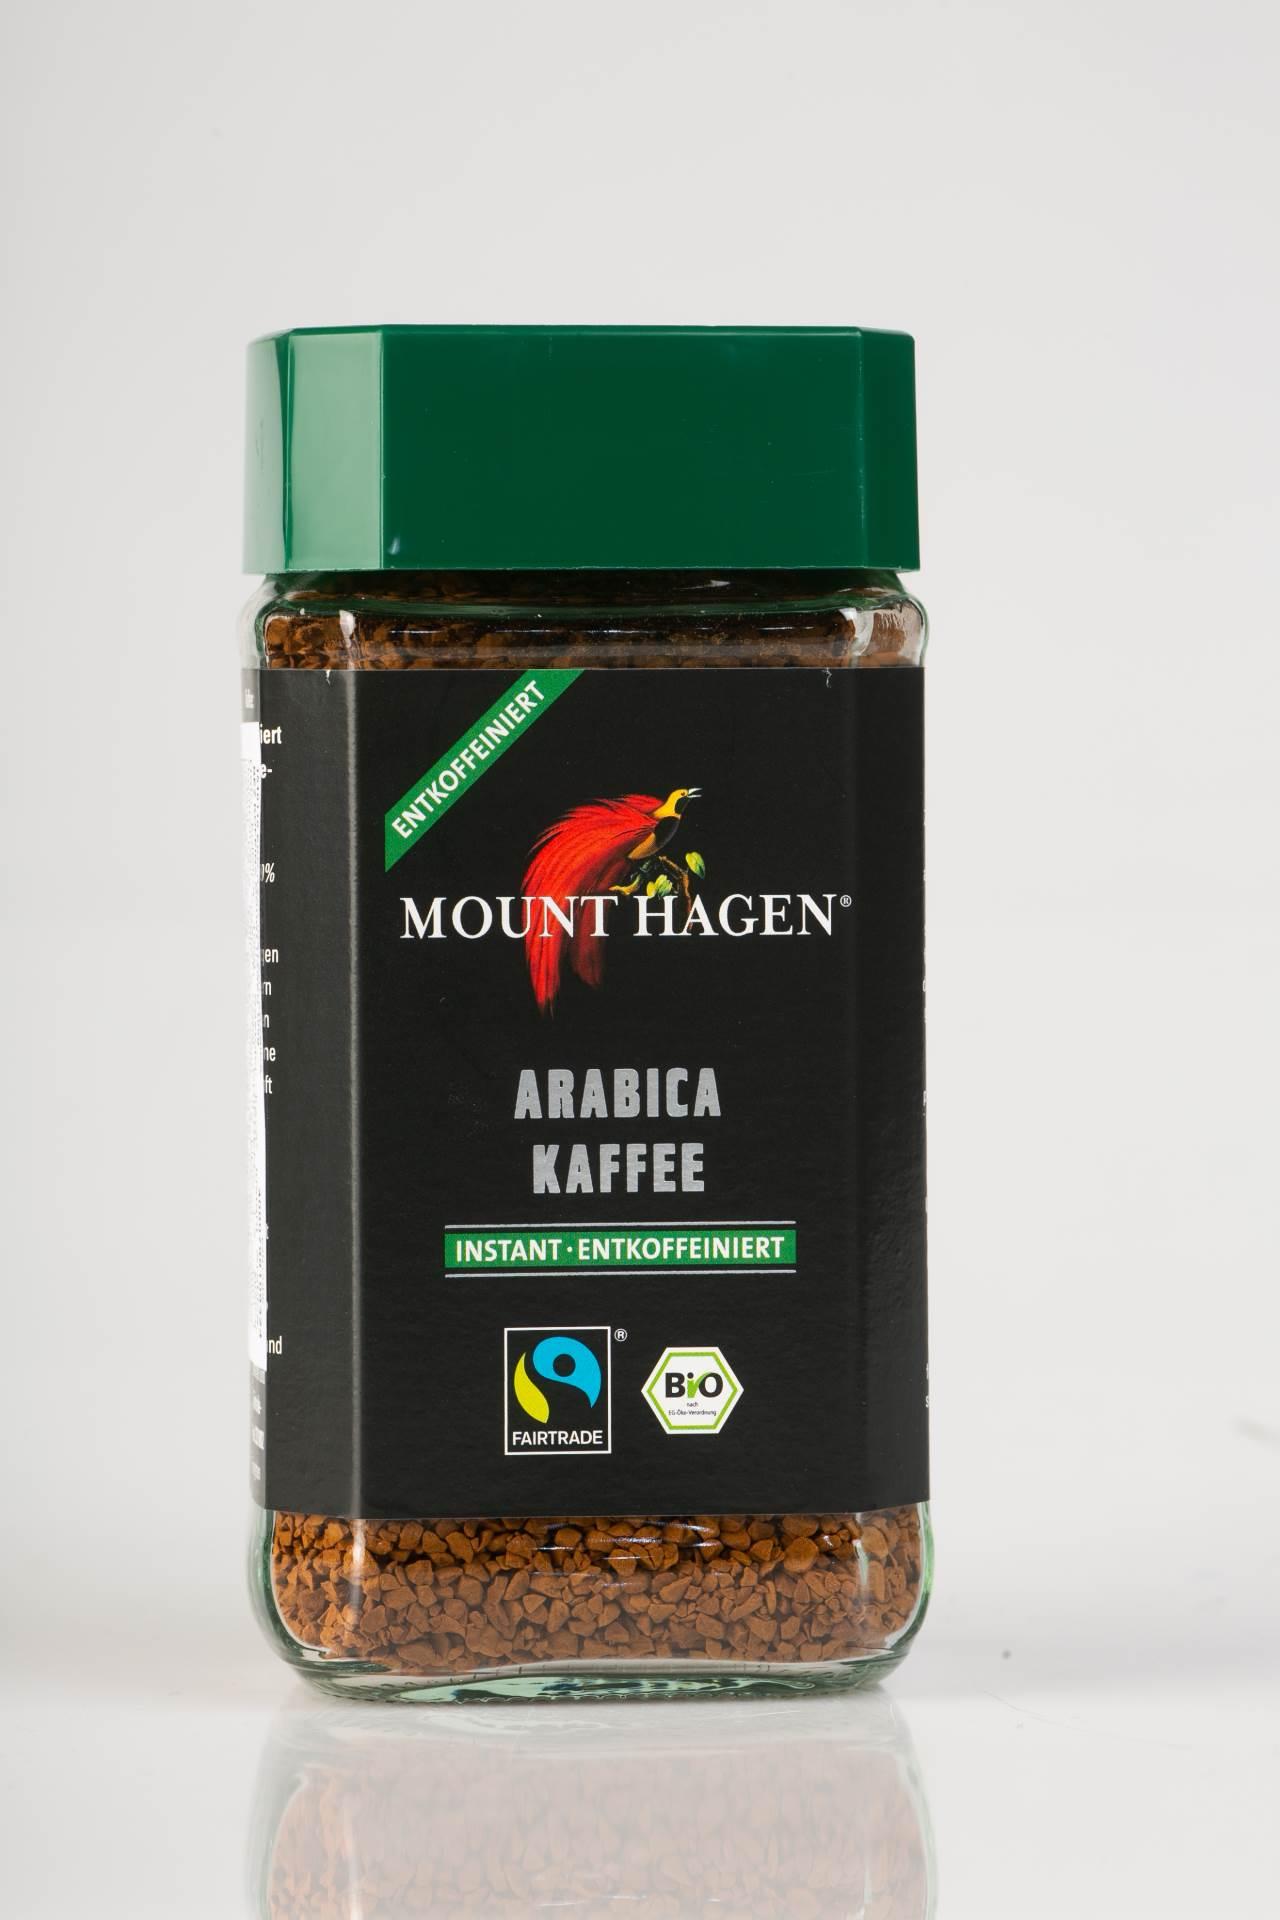 MOUNT HAGEN EKO kava instant bez kofeina 100g, dm TRAJNO DOBRA CIJENA 59,90 kn